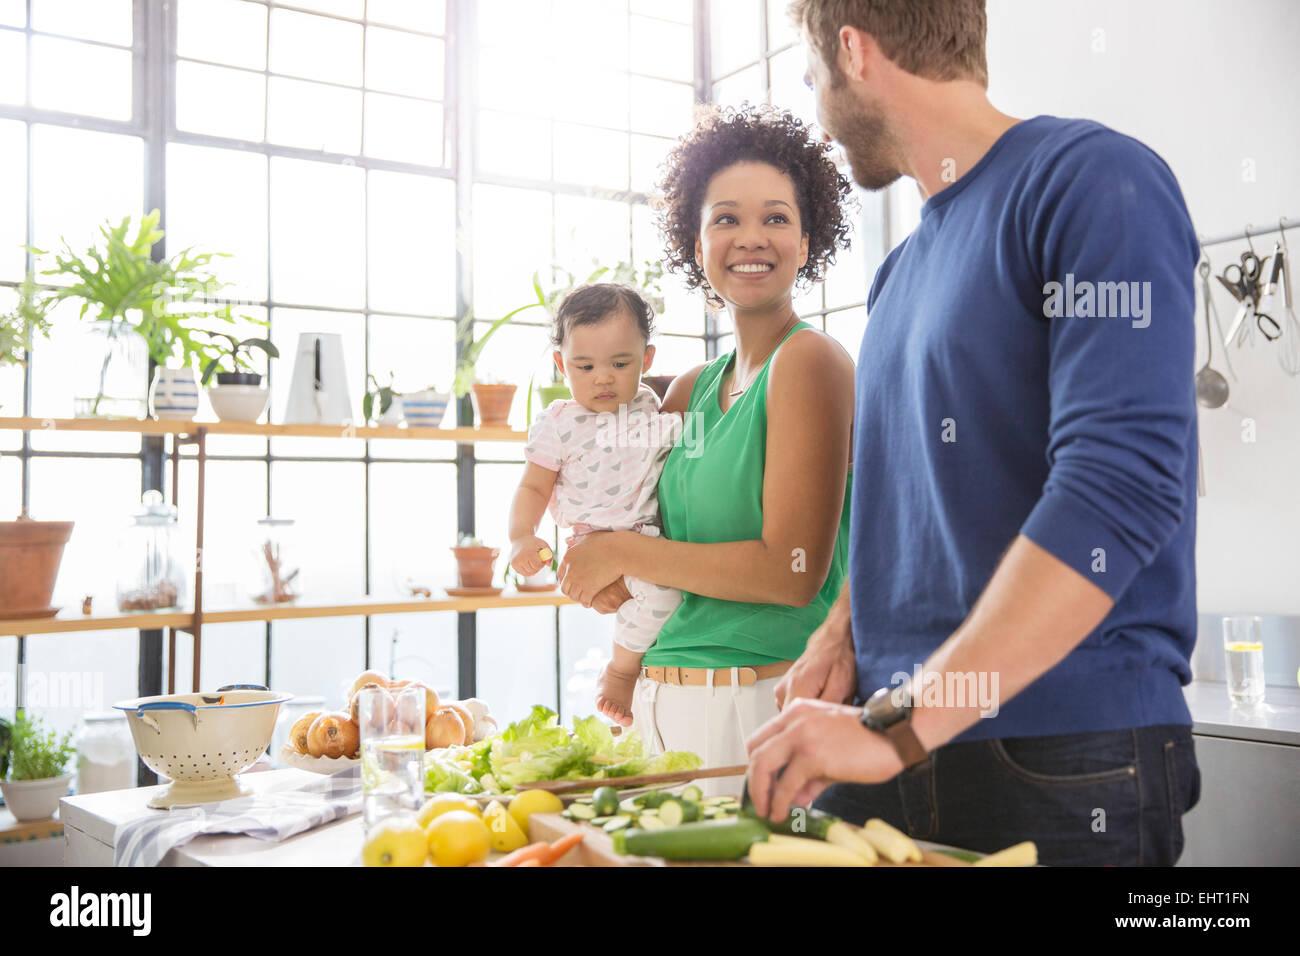 Happy family preparing meal in domestic kitchen - Stock Image